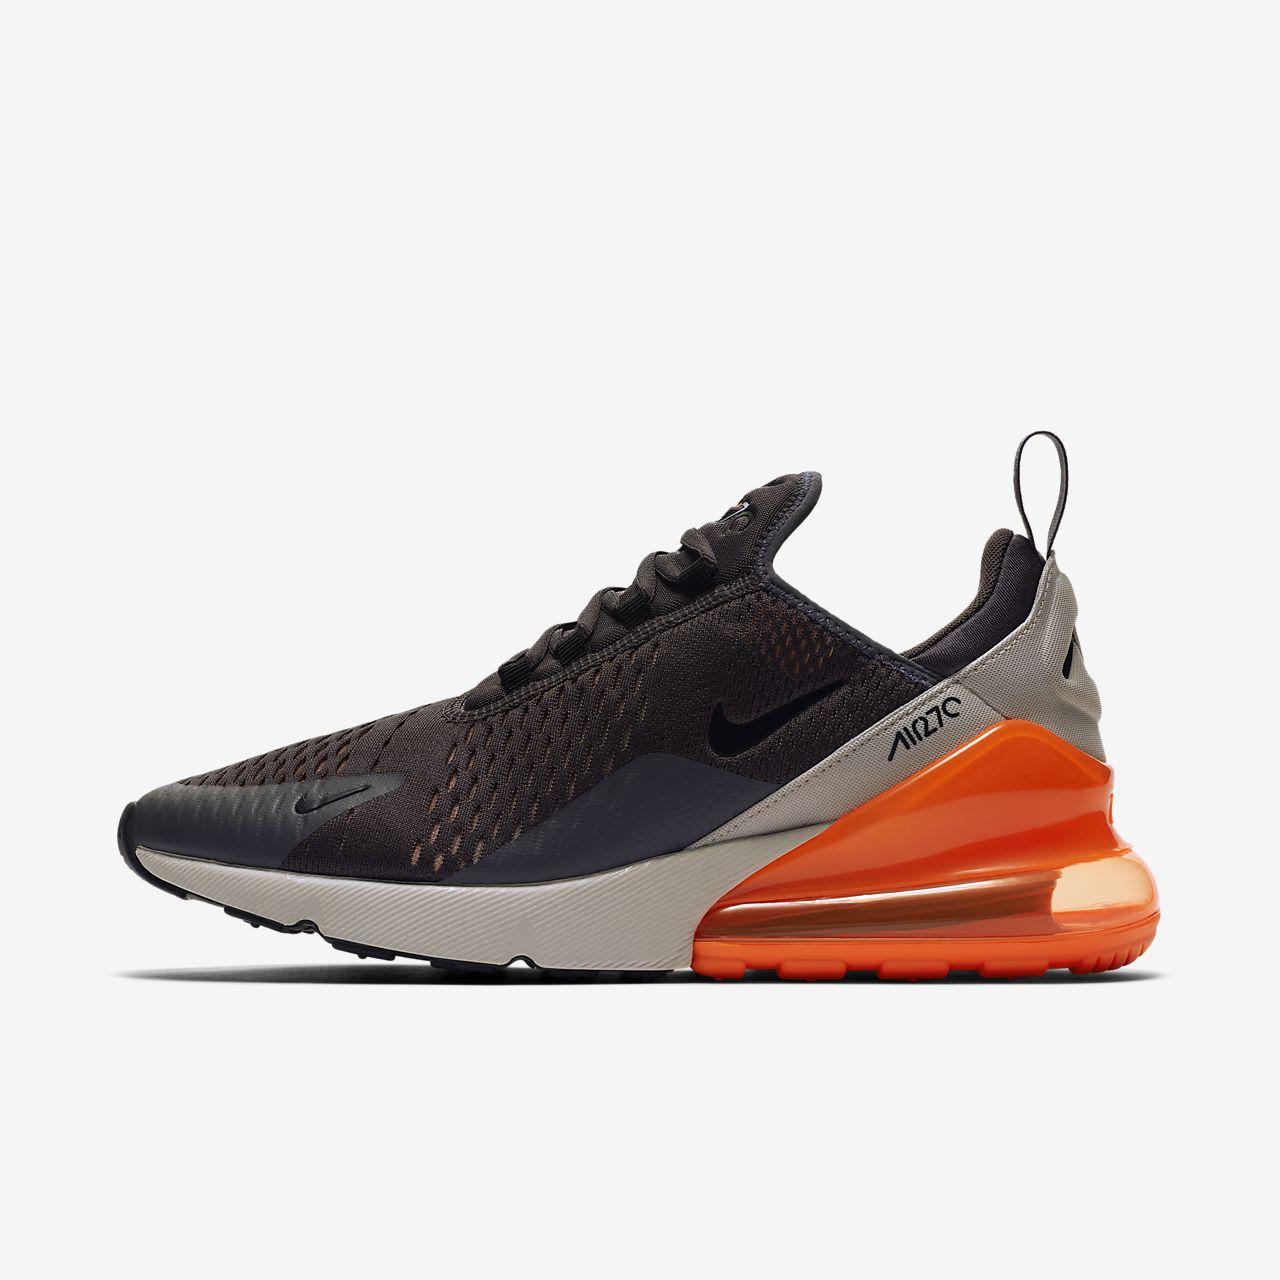 Scarpe Nike Air Max 90 Donna Grigio Blu Viola Online Shop